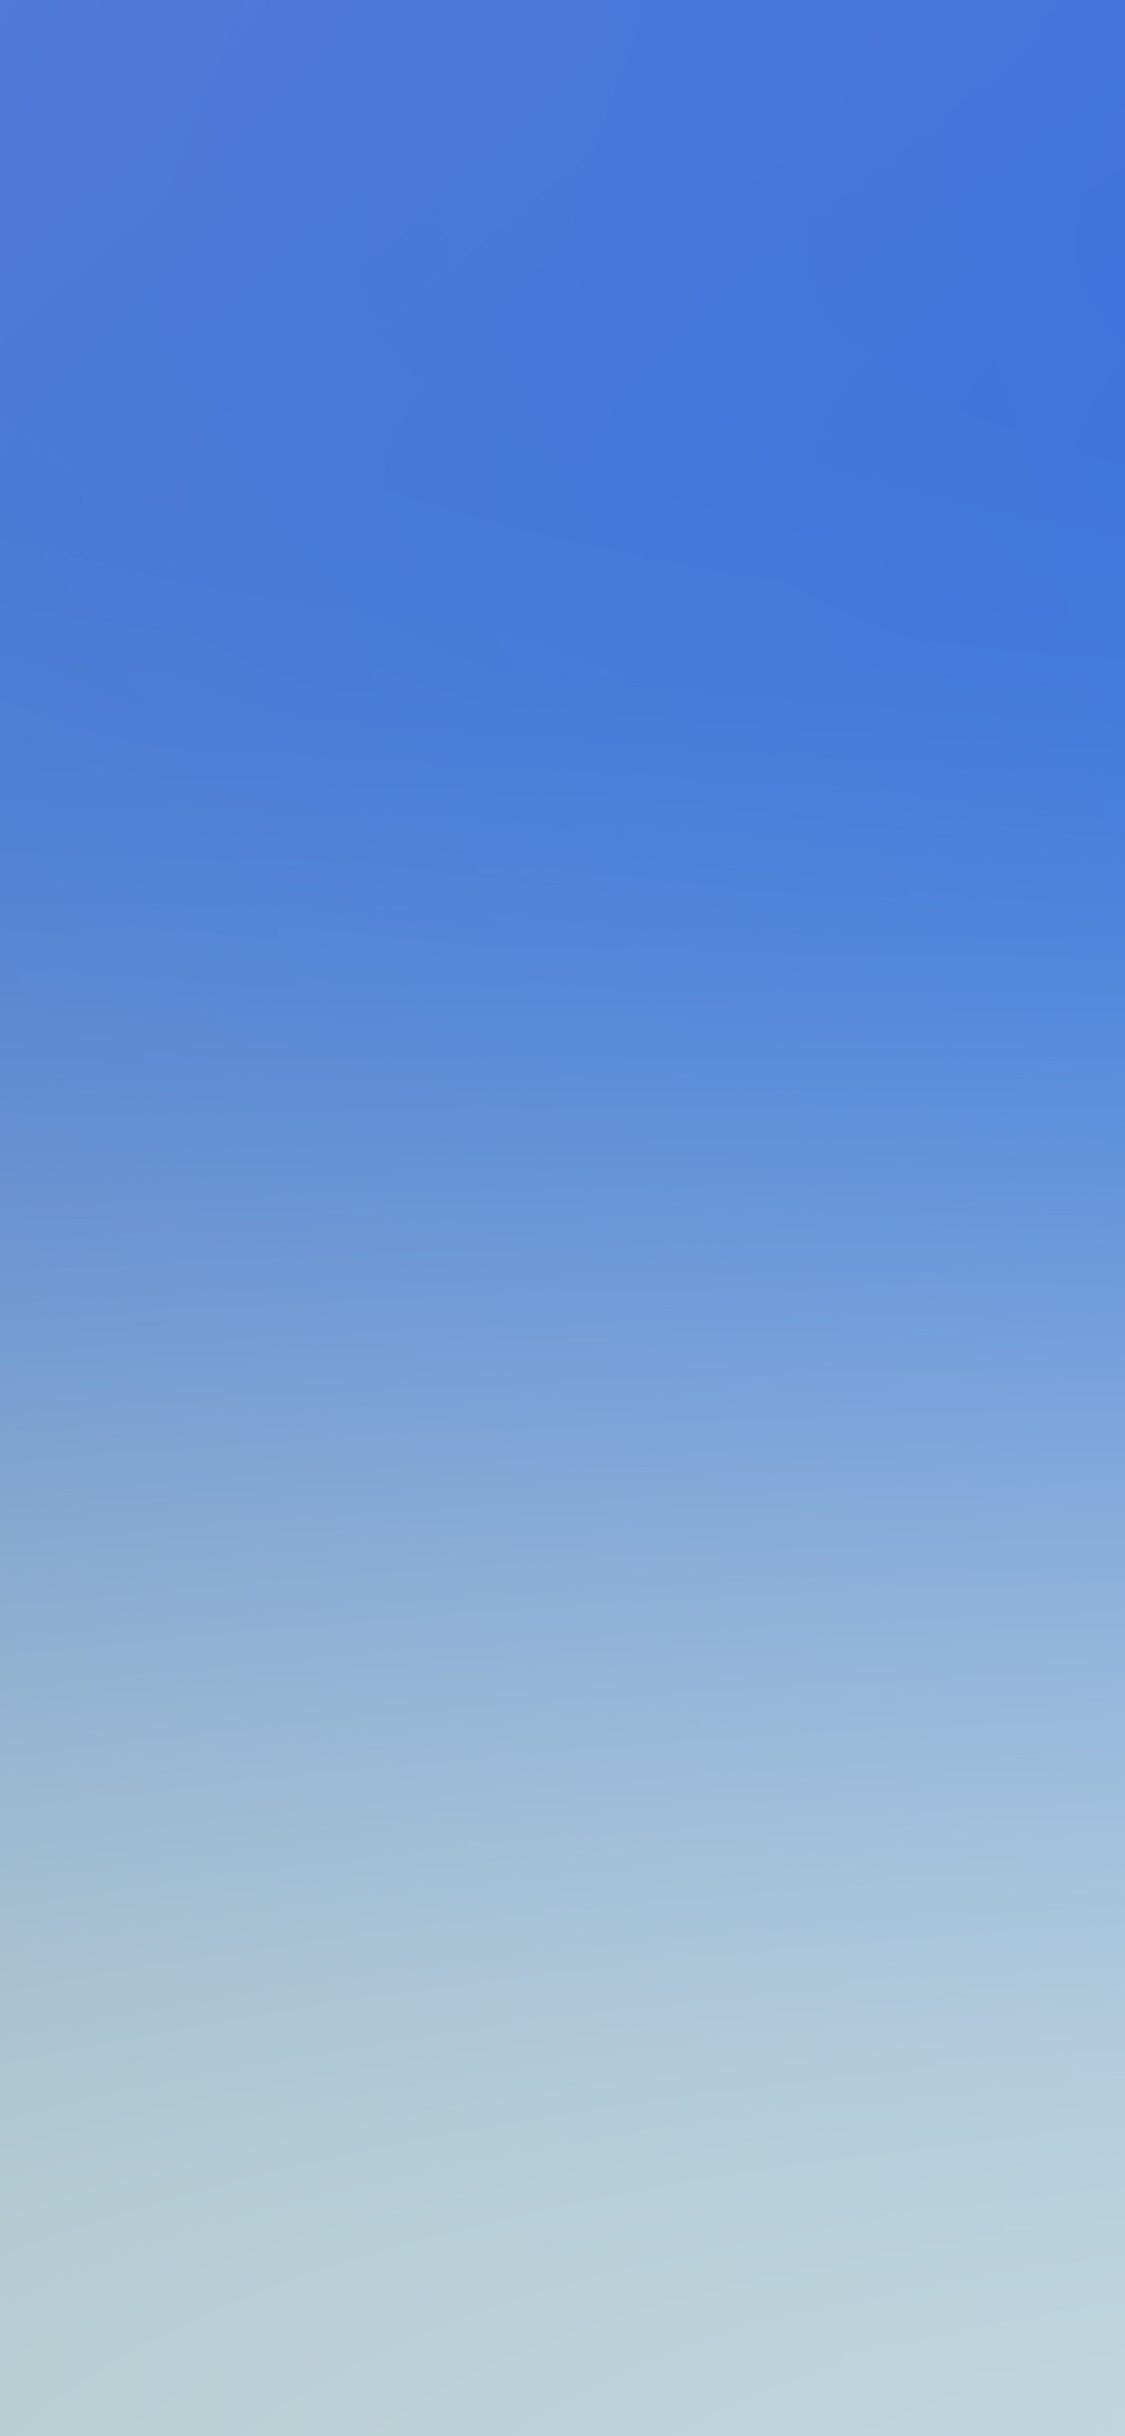 iPhoneXpapers.com-Apple-iPhone-wallpaper-si56-blue-sky-gradation-blur